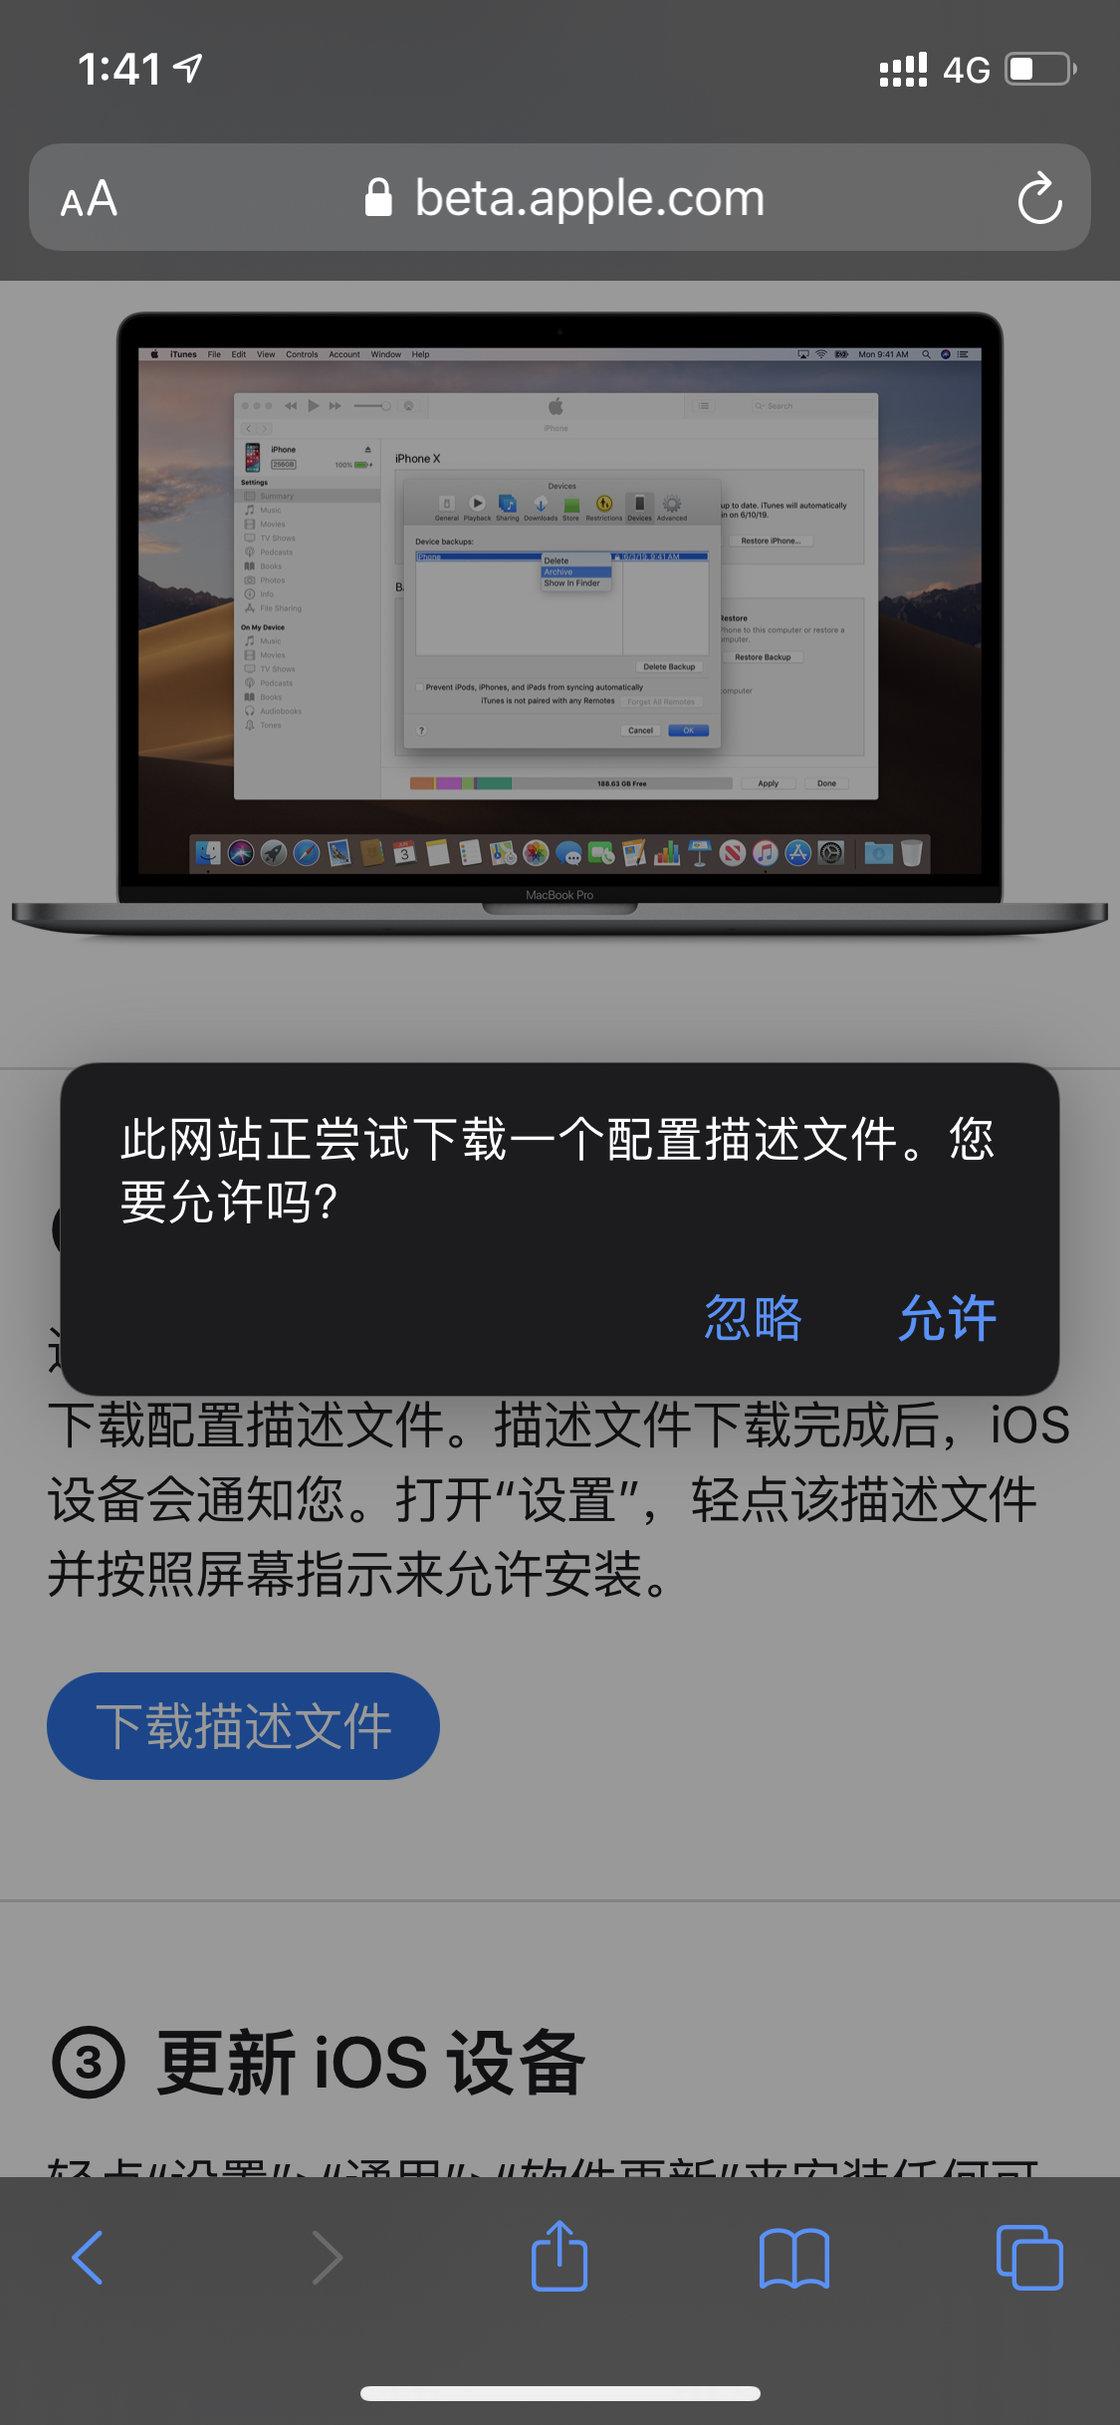 iOS / iPadOS 14 推出 Public Beta:新系统升降级指南 & 注意事项-OIMI